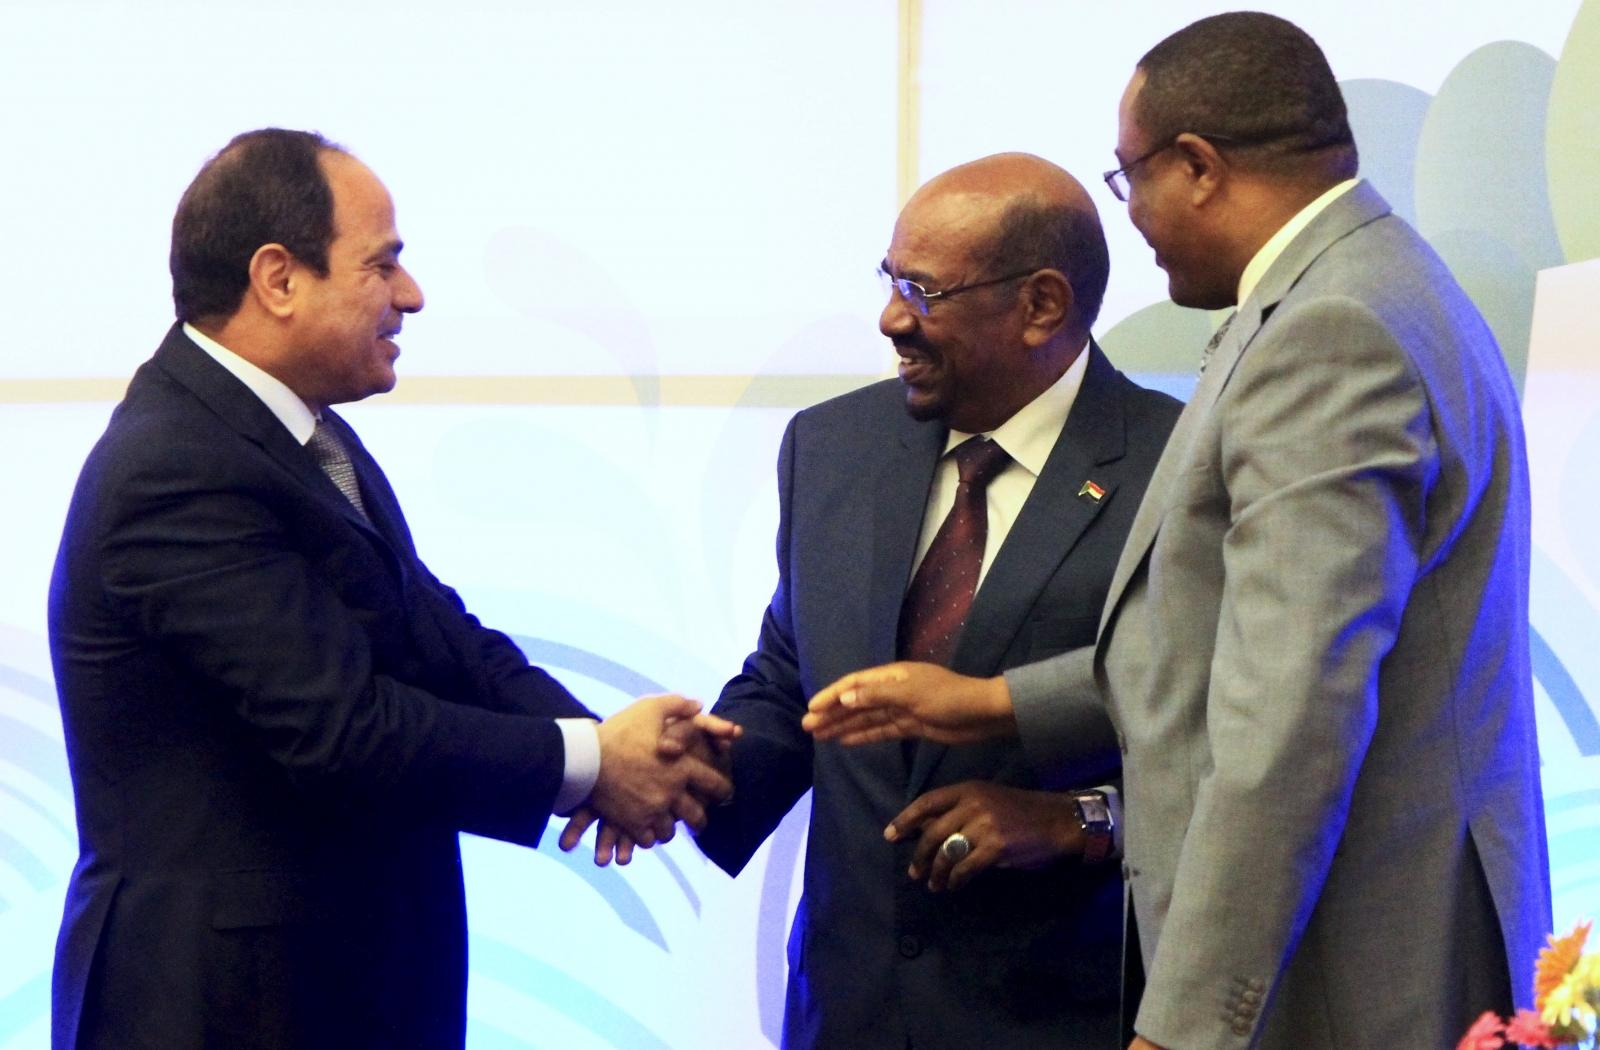 Sisi Bashir Desalegn